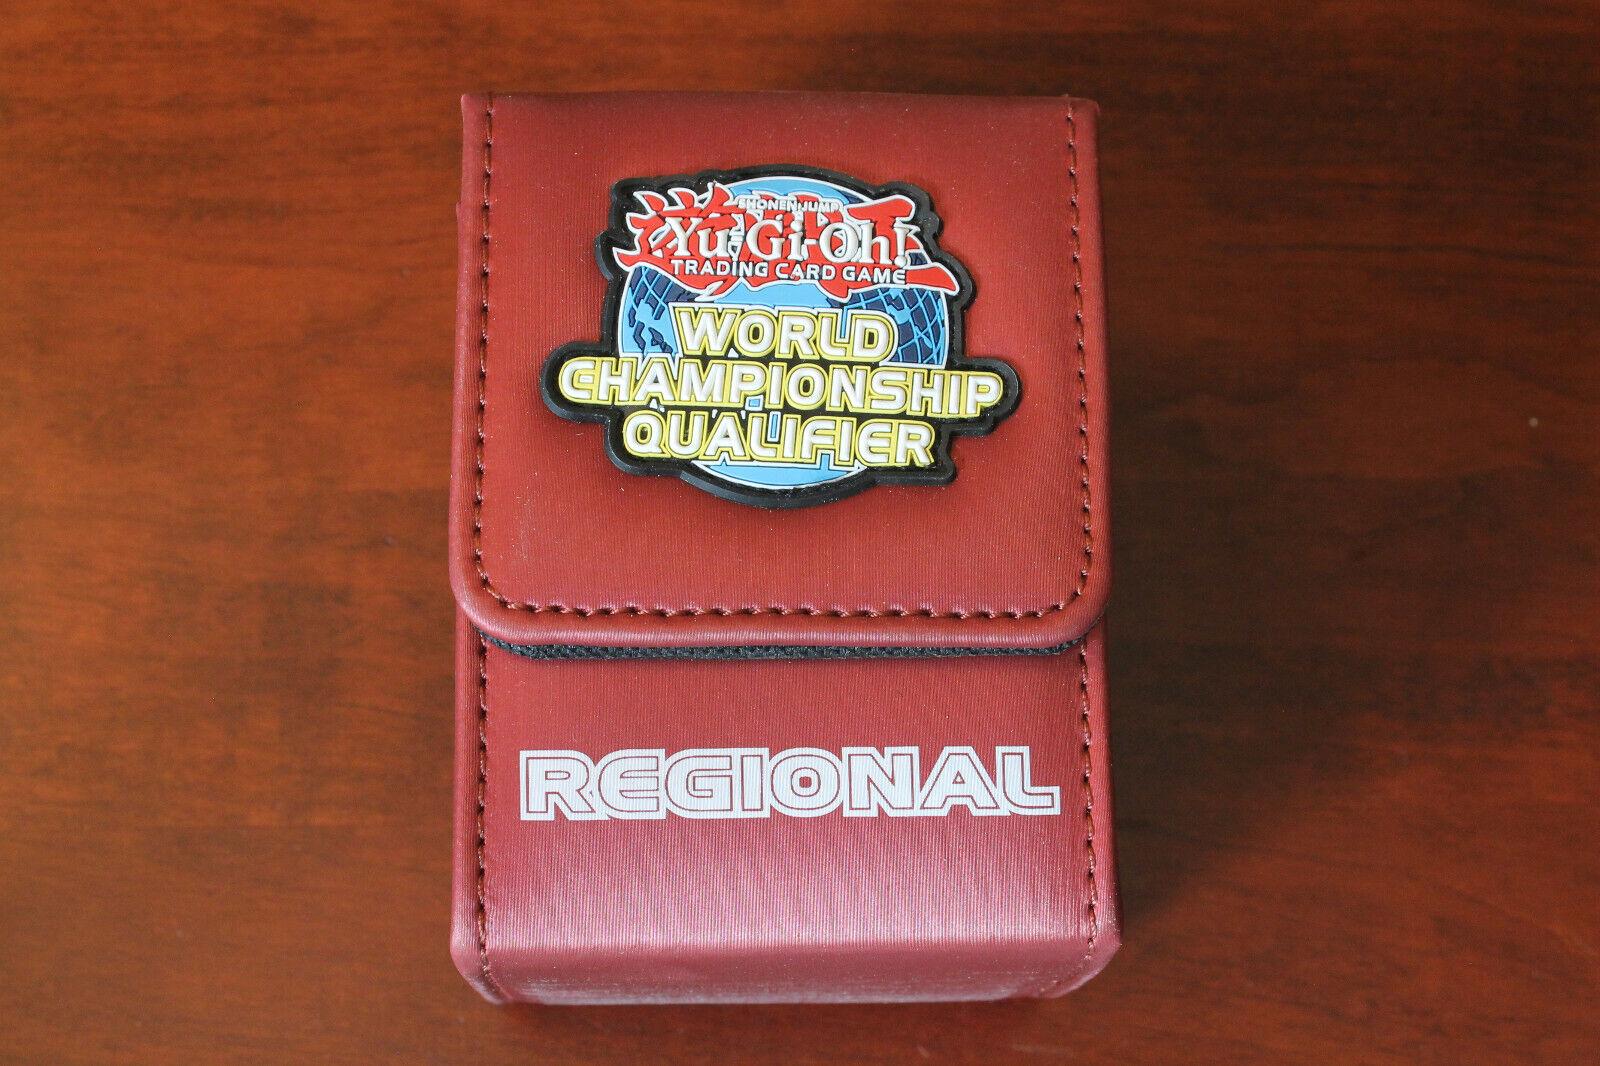 yugioh wcq regional deck box red not